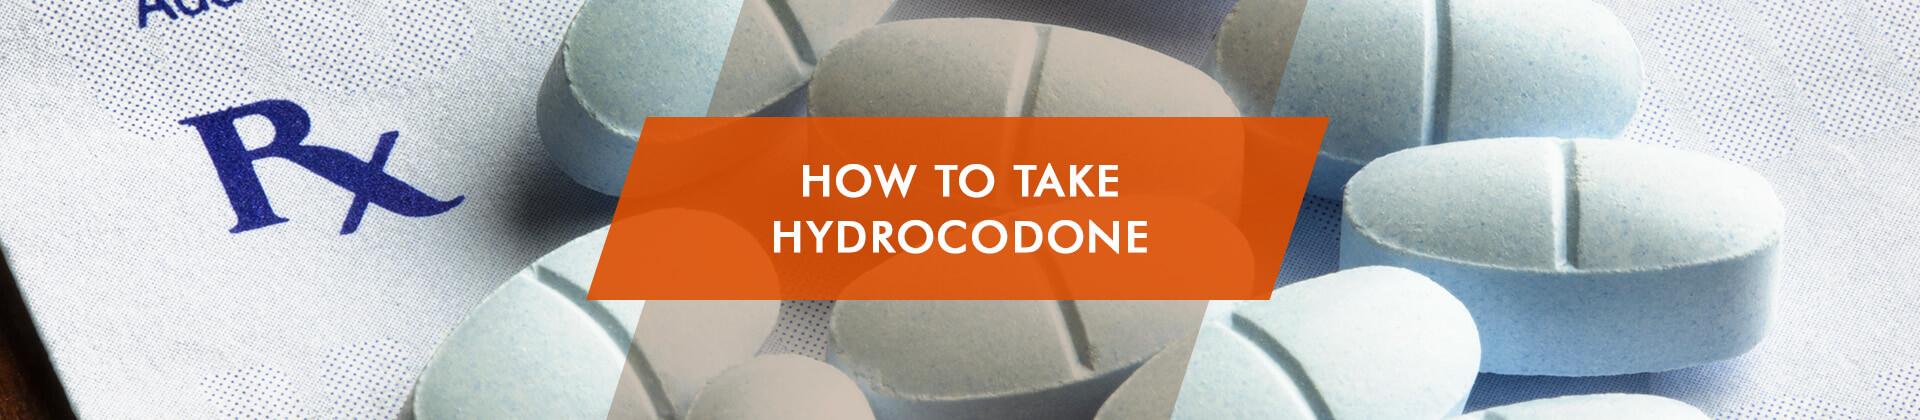 Ways to Take Hydrocodone: Smoking, Plugging and Shooting Opioids